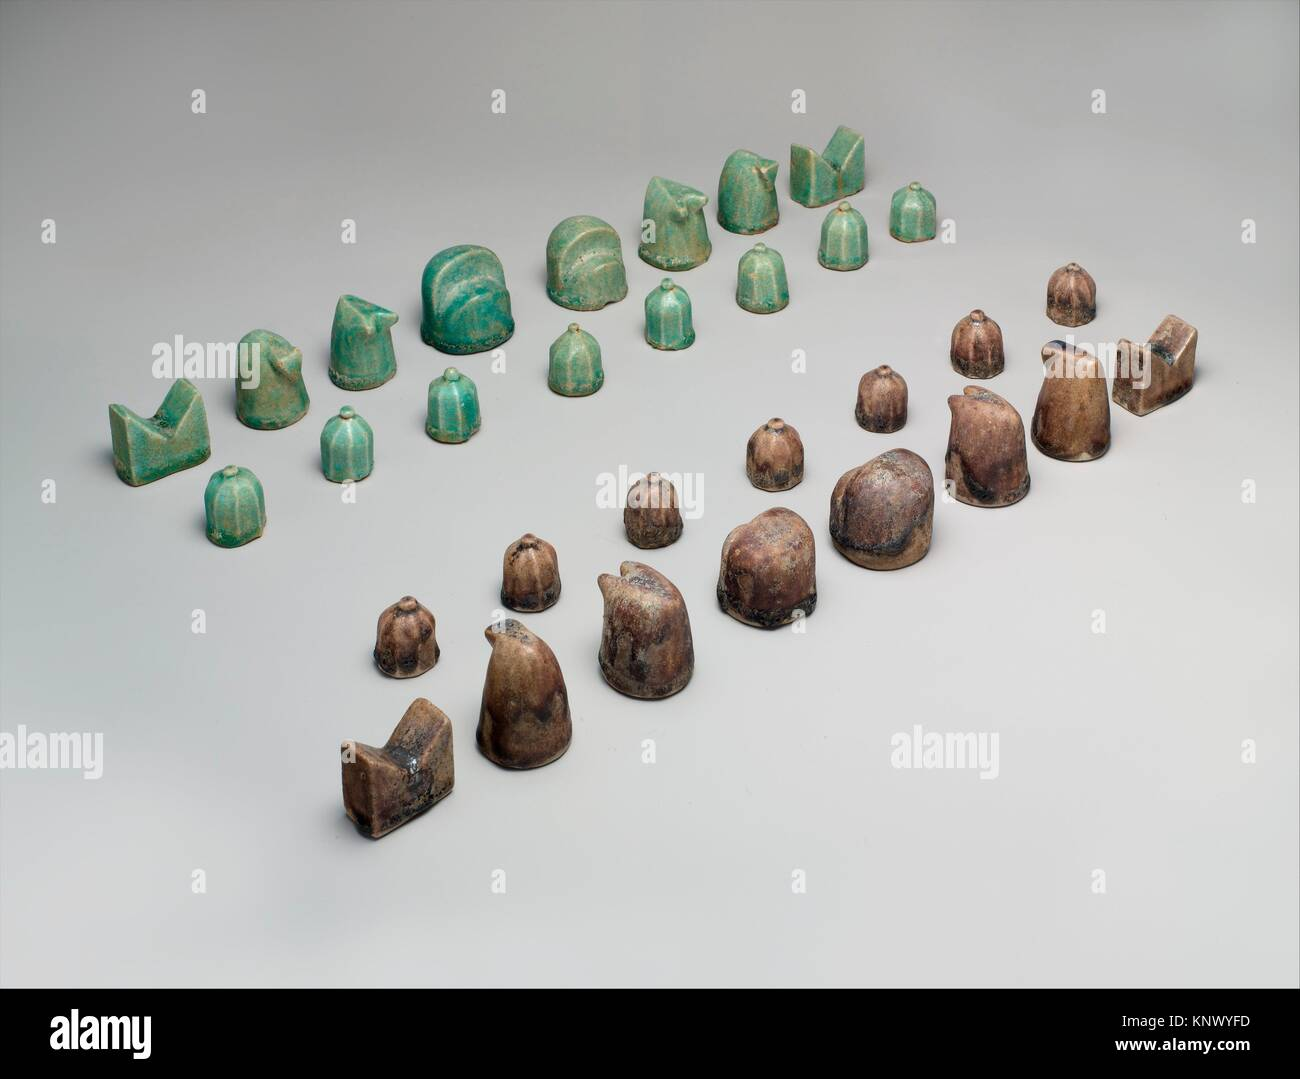 Chess Set. Object Name: Chess set; Date: 12th century; Geography: Attributed to Iran, Nishapur; Medium: Stonepaste; Stock Photo